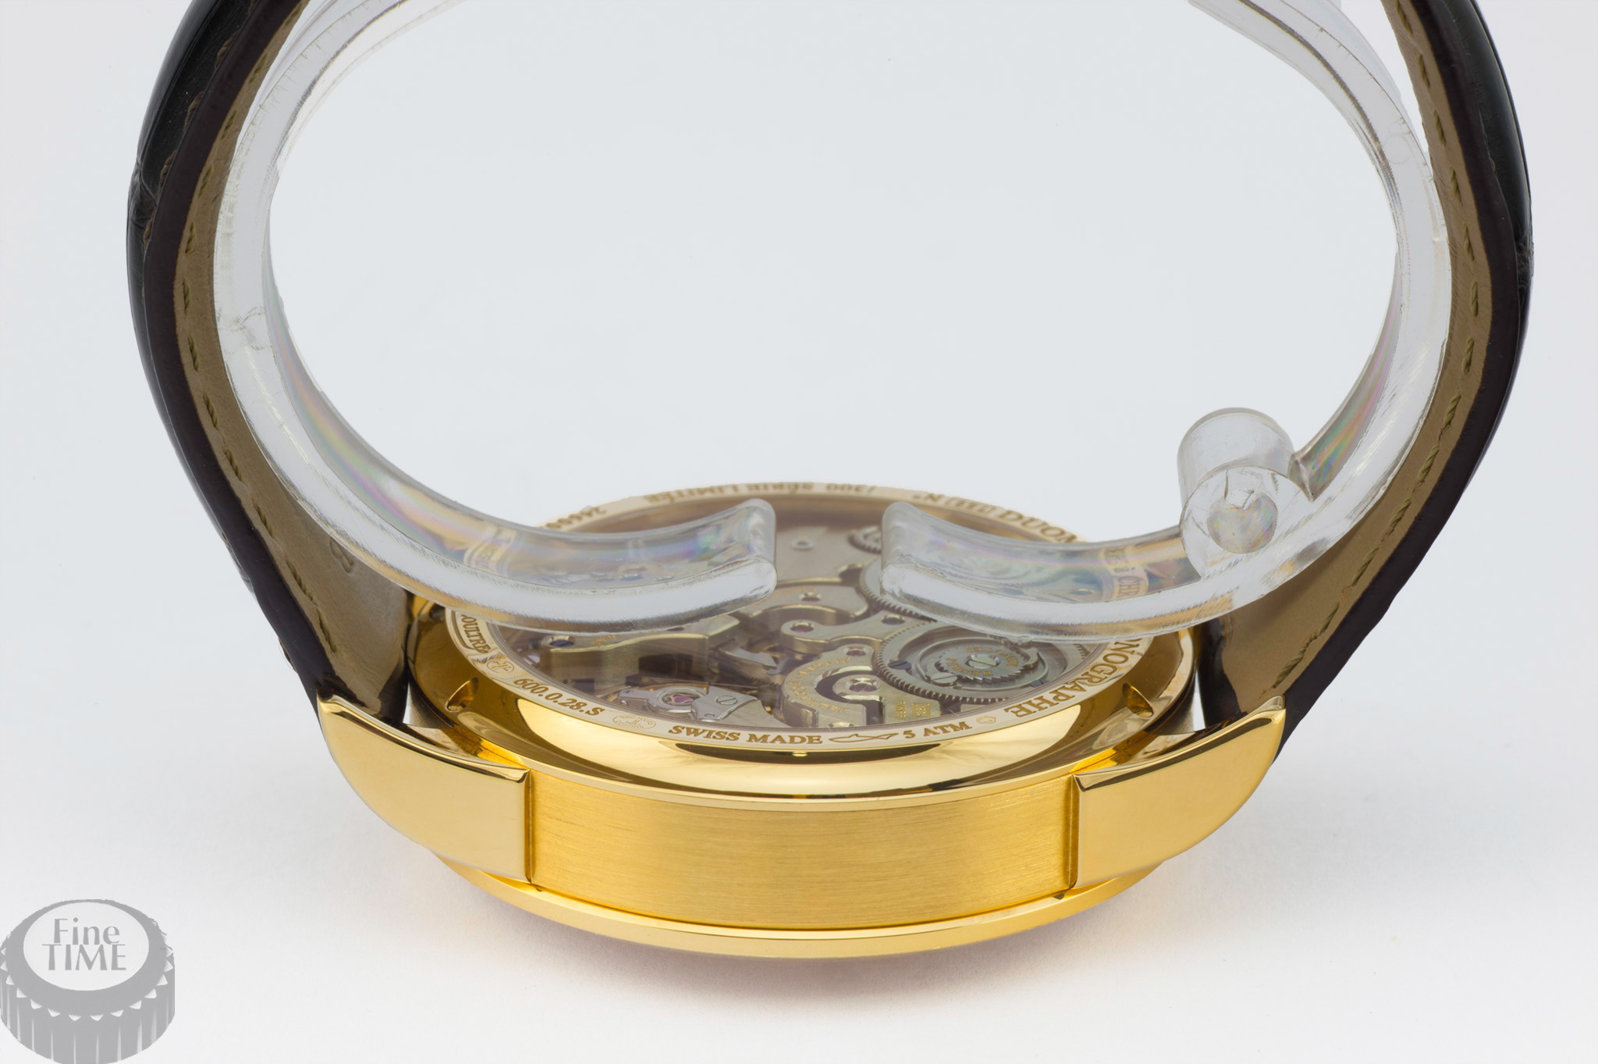 jaeger-lecoultre-duometre-chronographe-q6011420-04.jpg